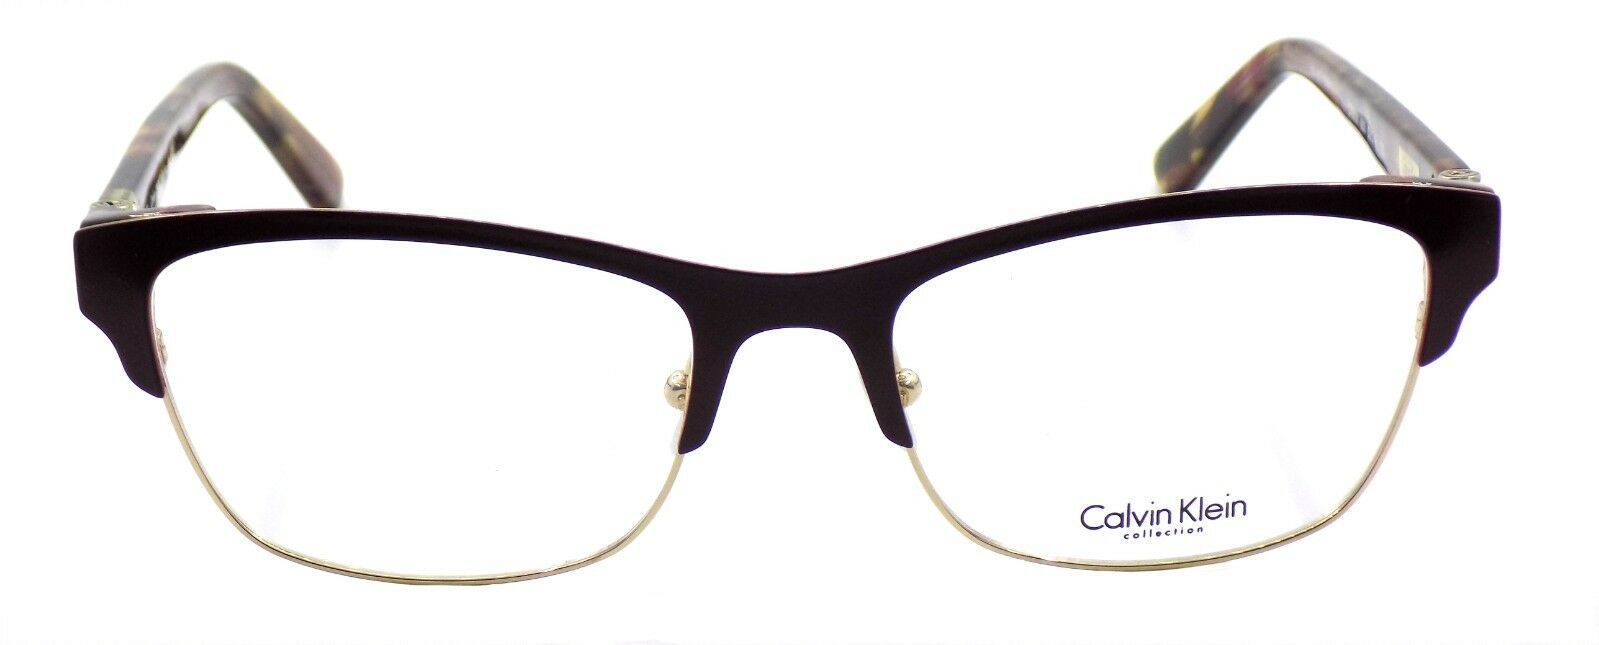 Calvin Klein CK8021 603 Women's Eyeglasses Frames Bordeaux 53-18-135 + CASE